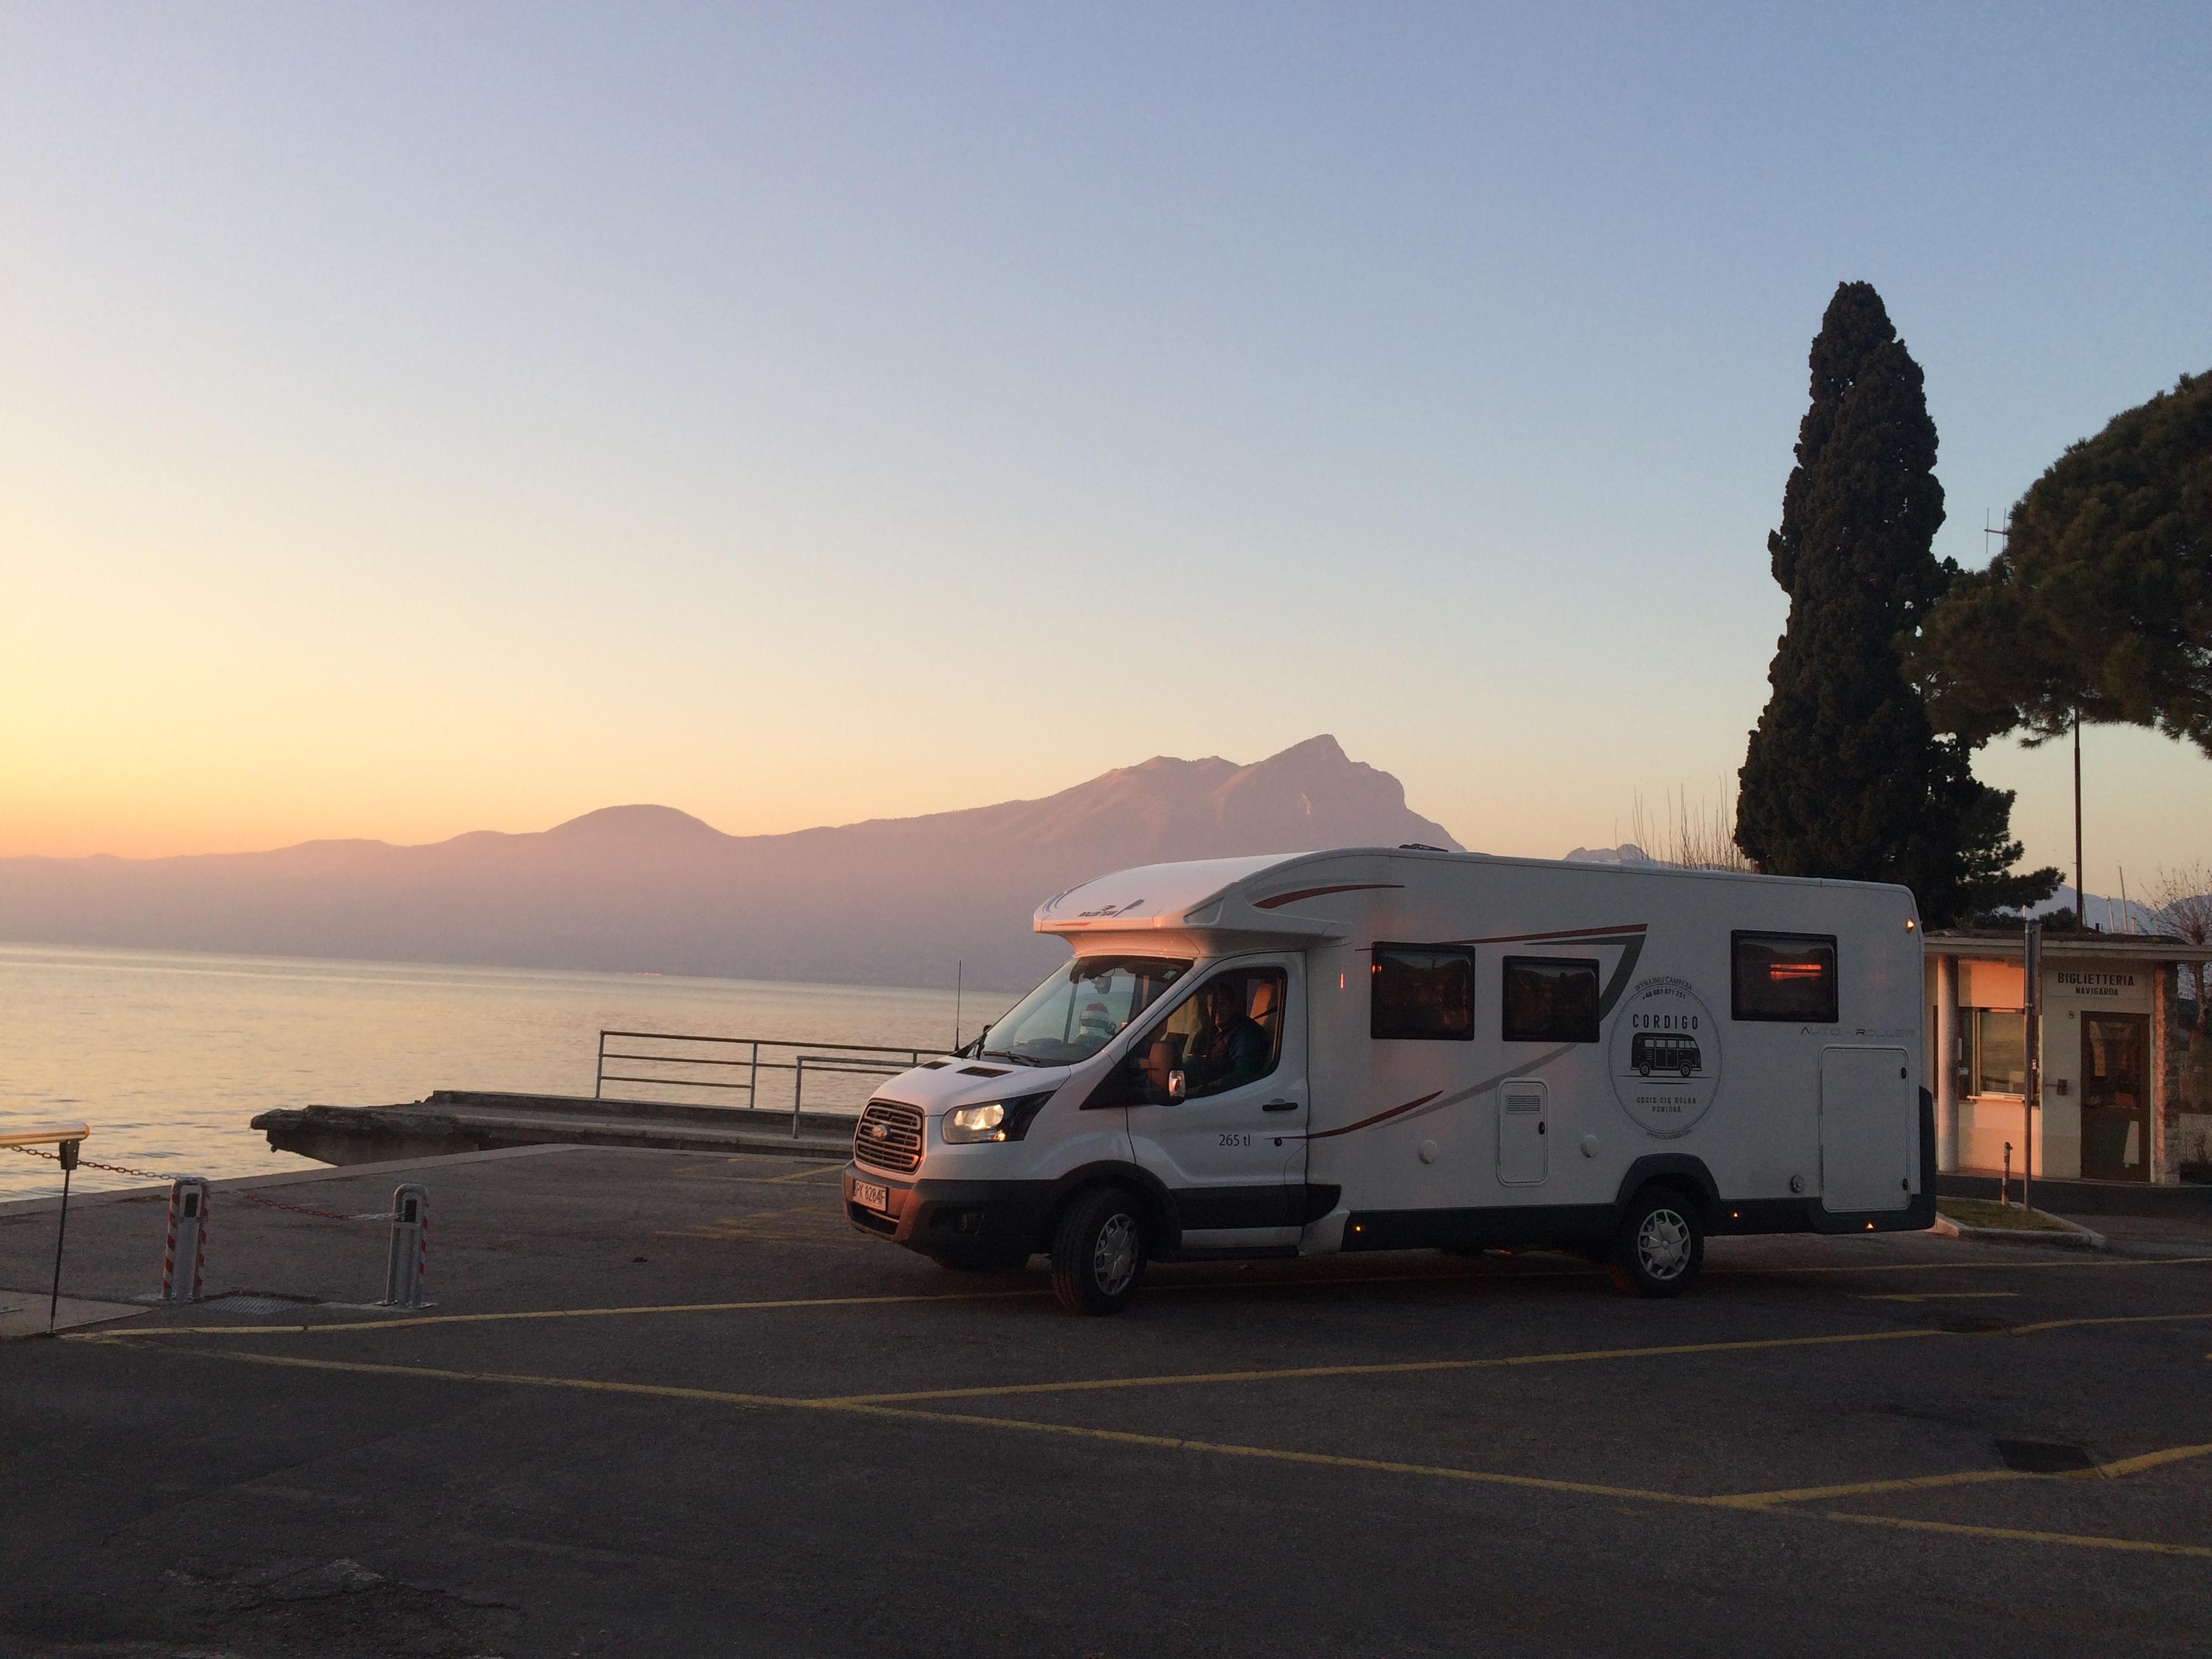 podróż kamperem, wakacje kamperem, podróżowanie z kamperem, kamper z dziećmi, jak podróżować kamperem